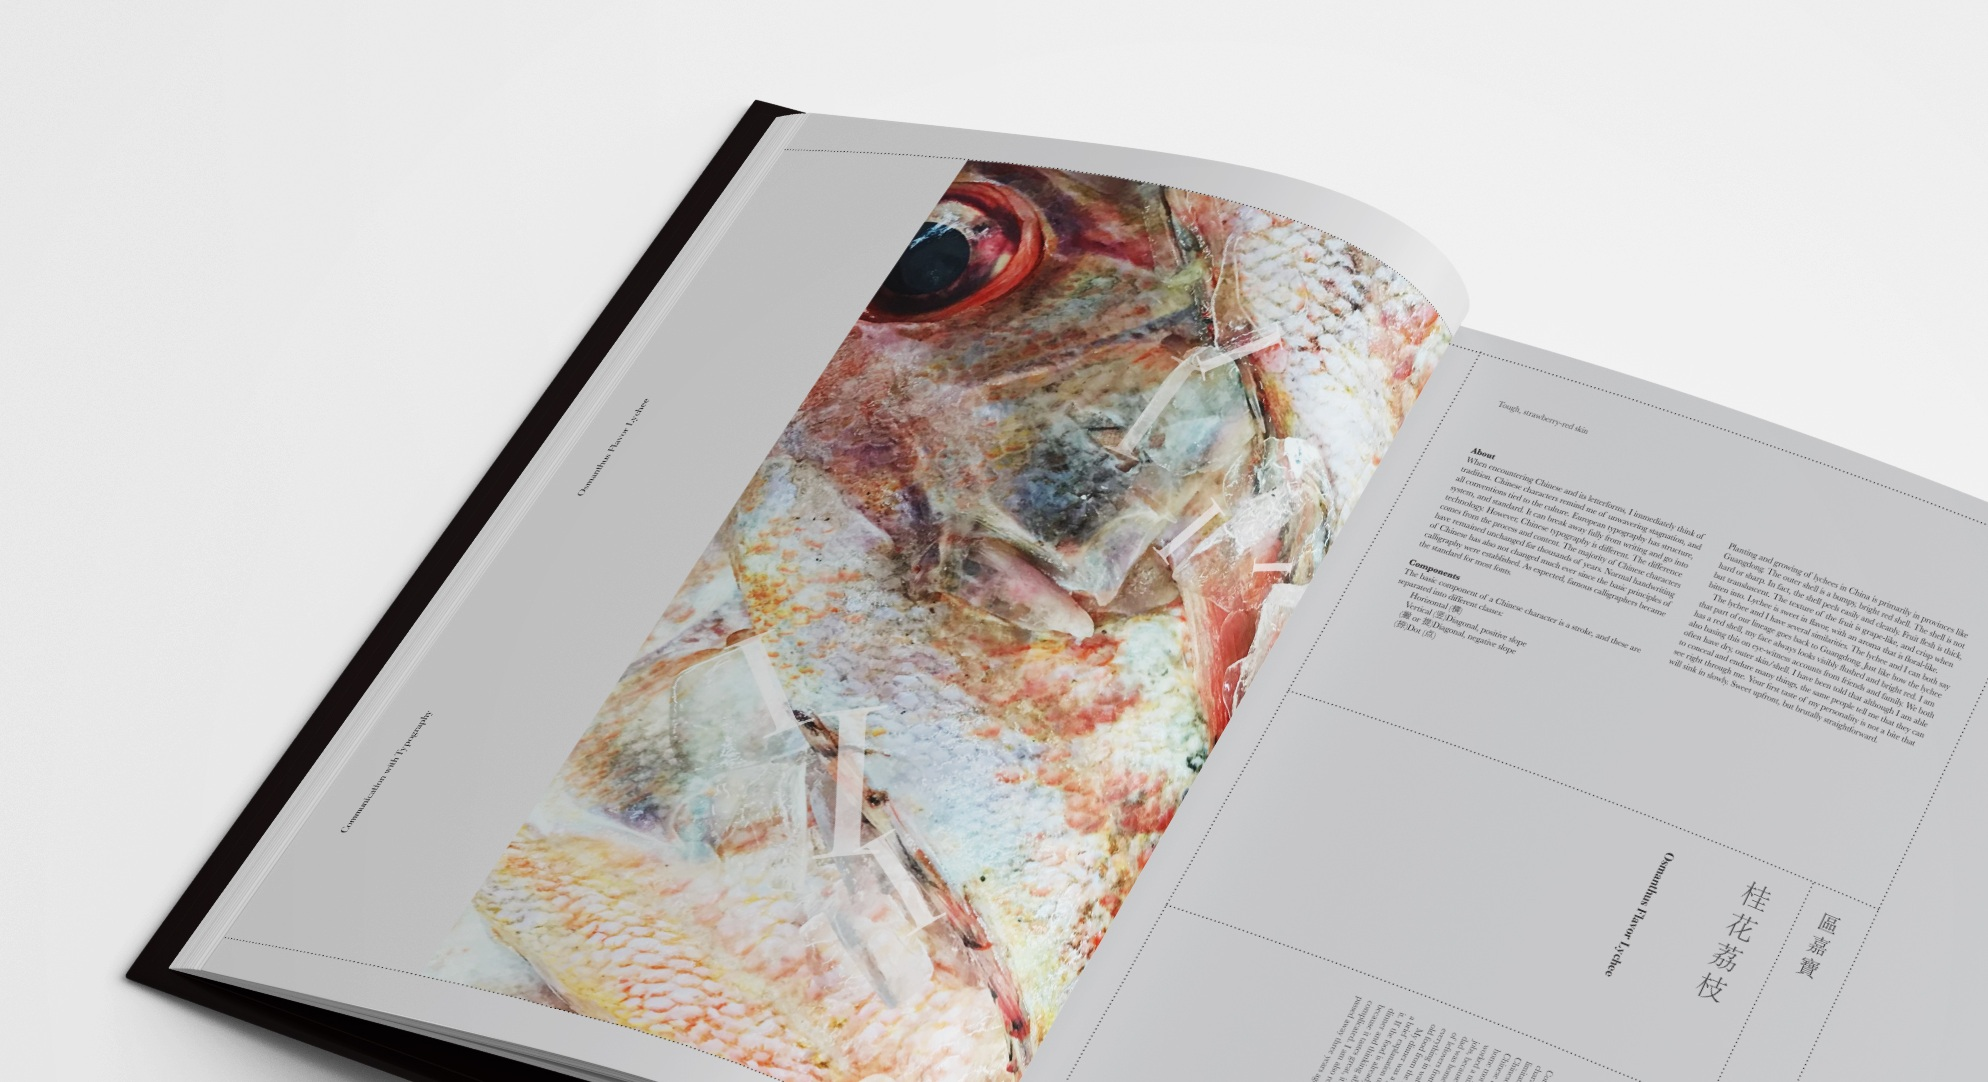 BookInterior3.jpg